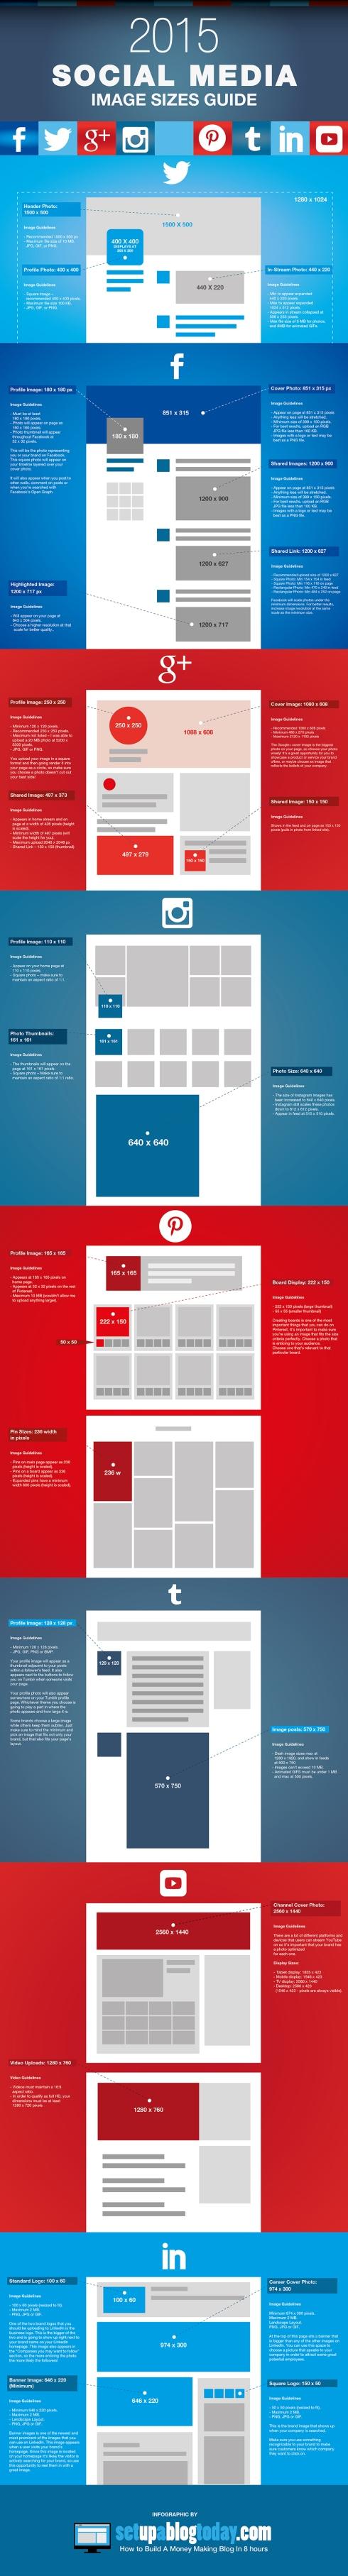 Social Media Image Sizes Cheat Sheet [INFOGRAPHIC]